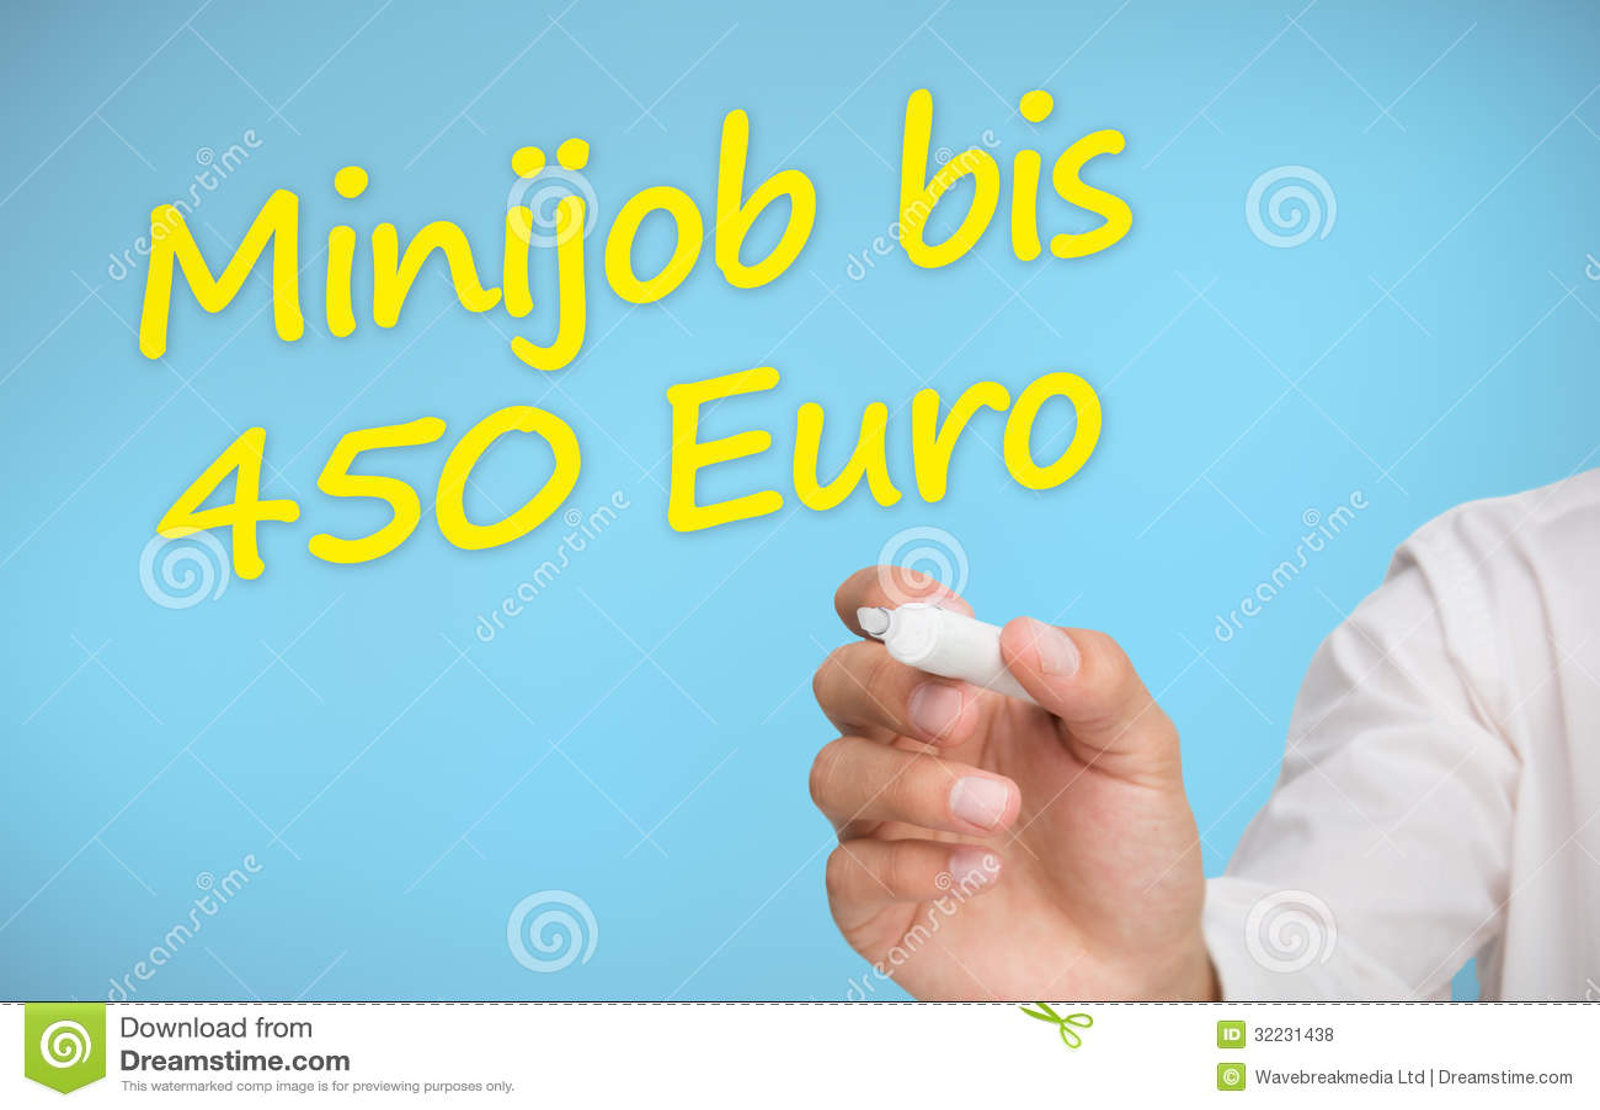 businessman writing in yellow minijob bis 450 euro stock illustration illustration of. Black Bedroom Furniture Sets. Home Design Ideas